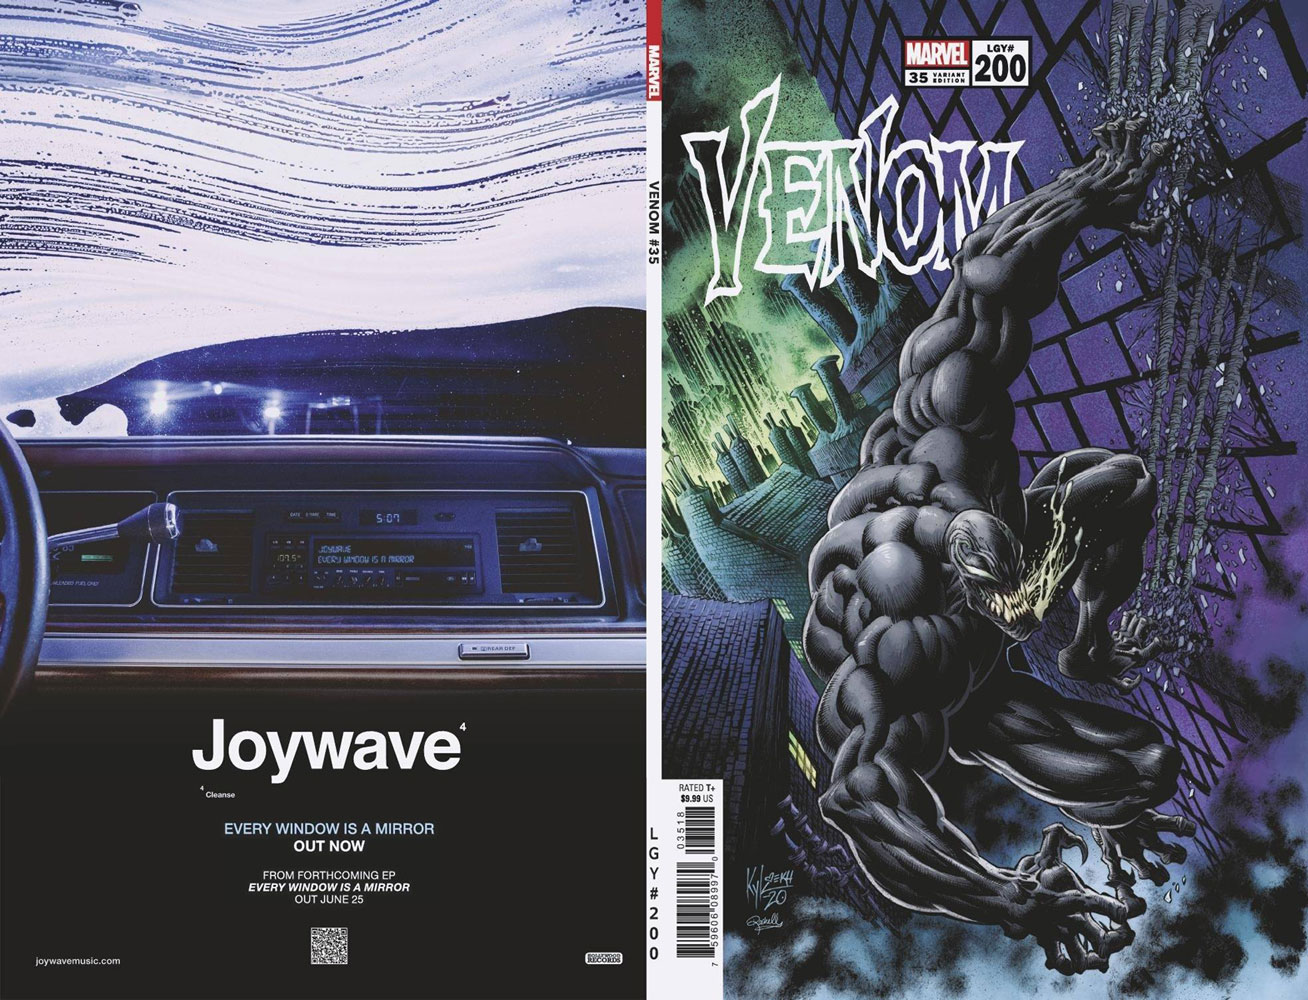 Venom #35 (variant cover - Kyle Hotz) - Marvel Comics